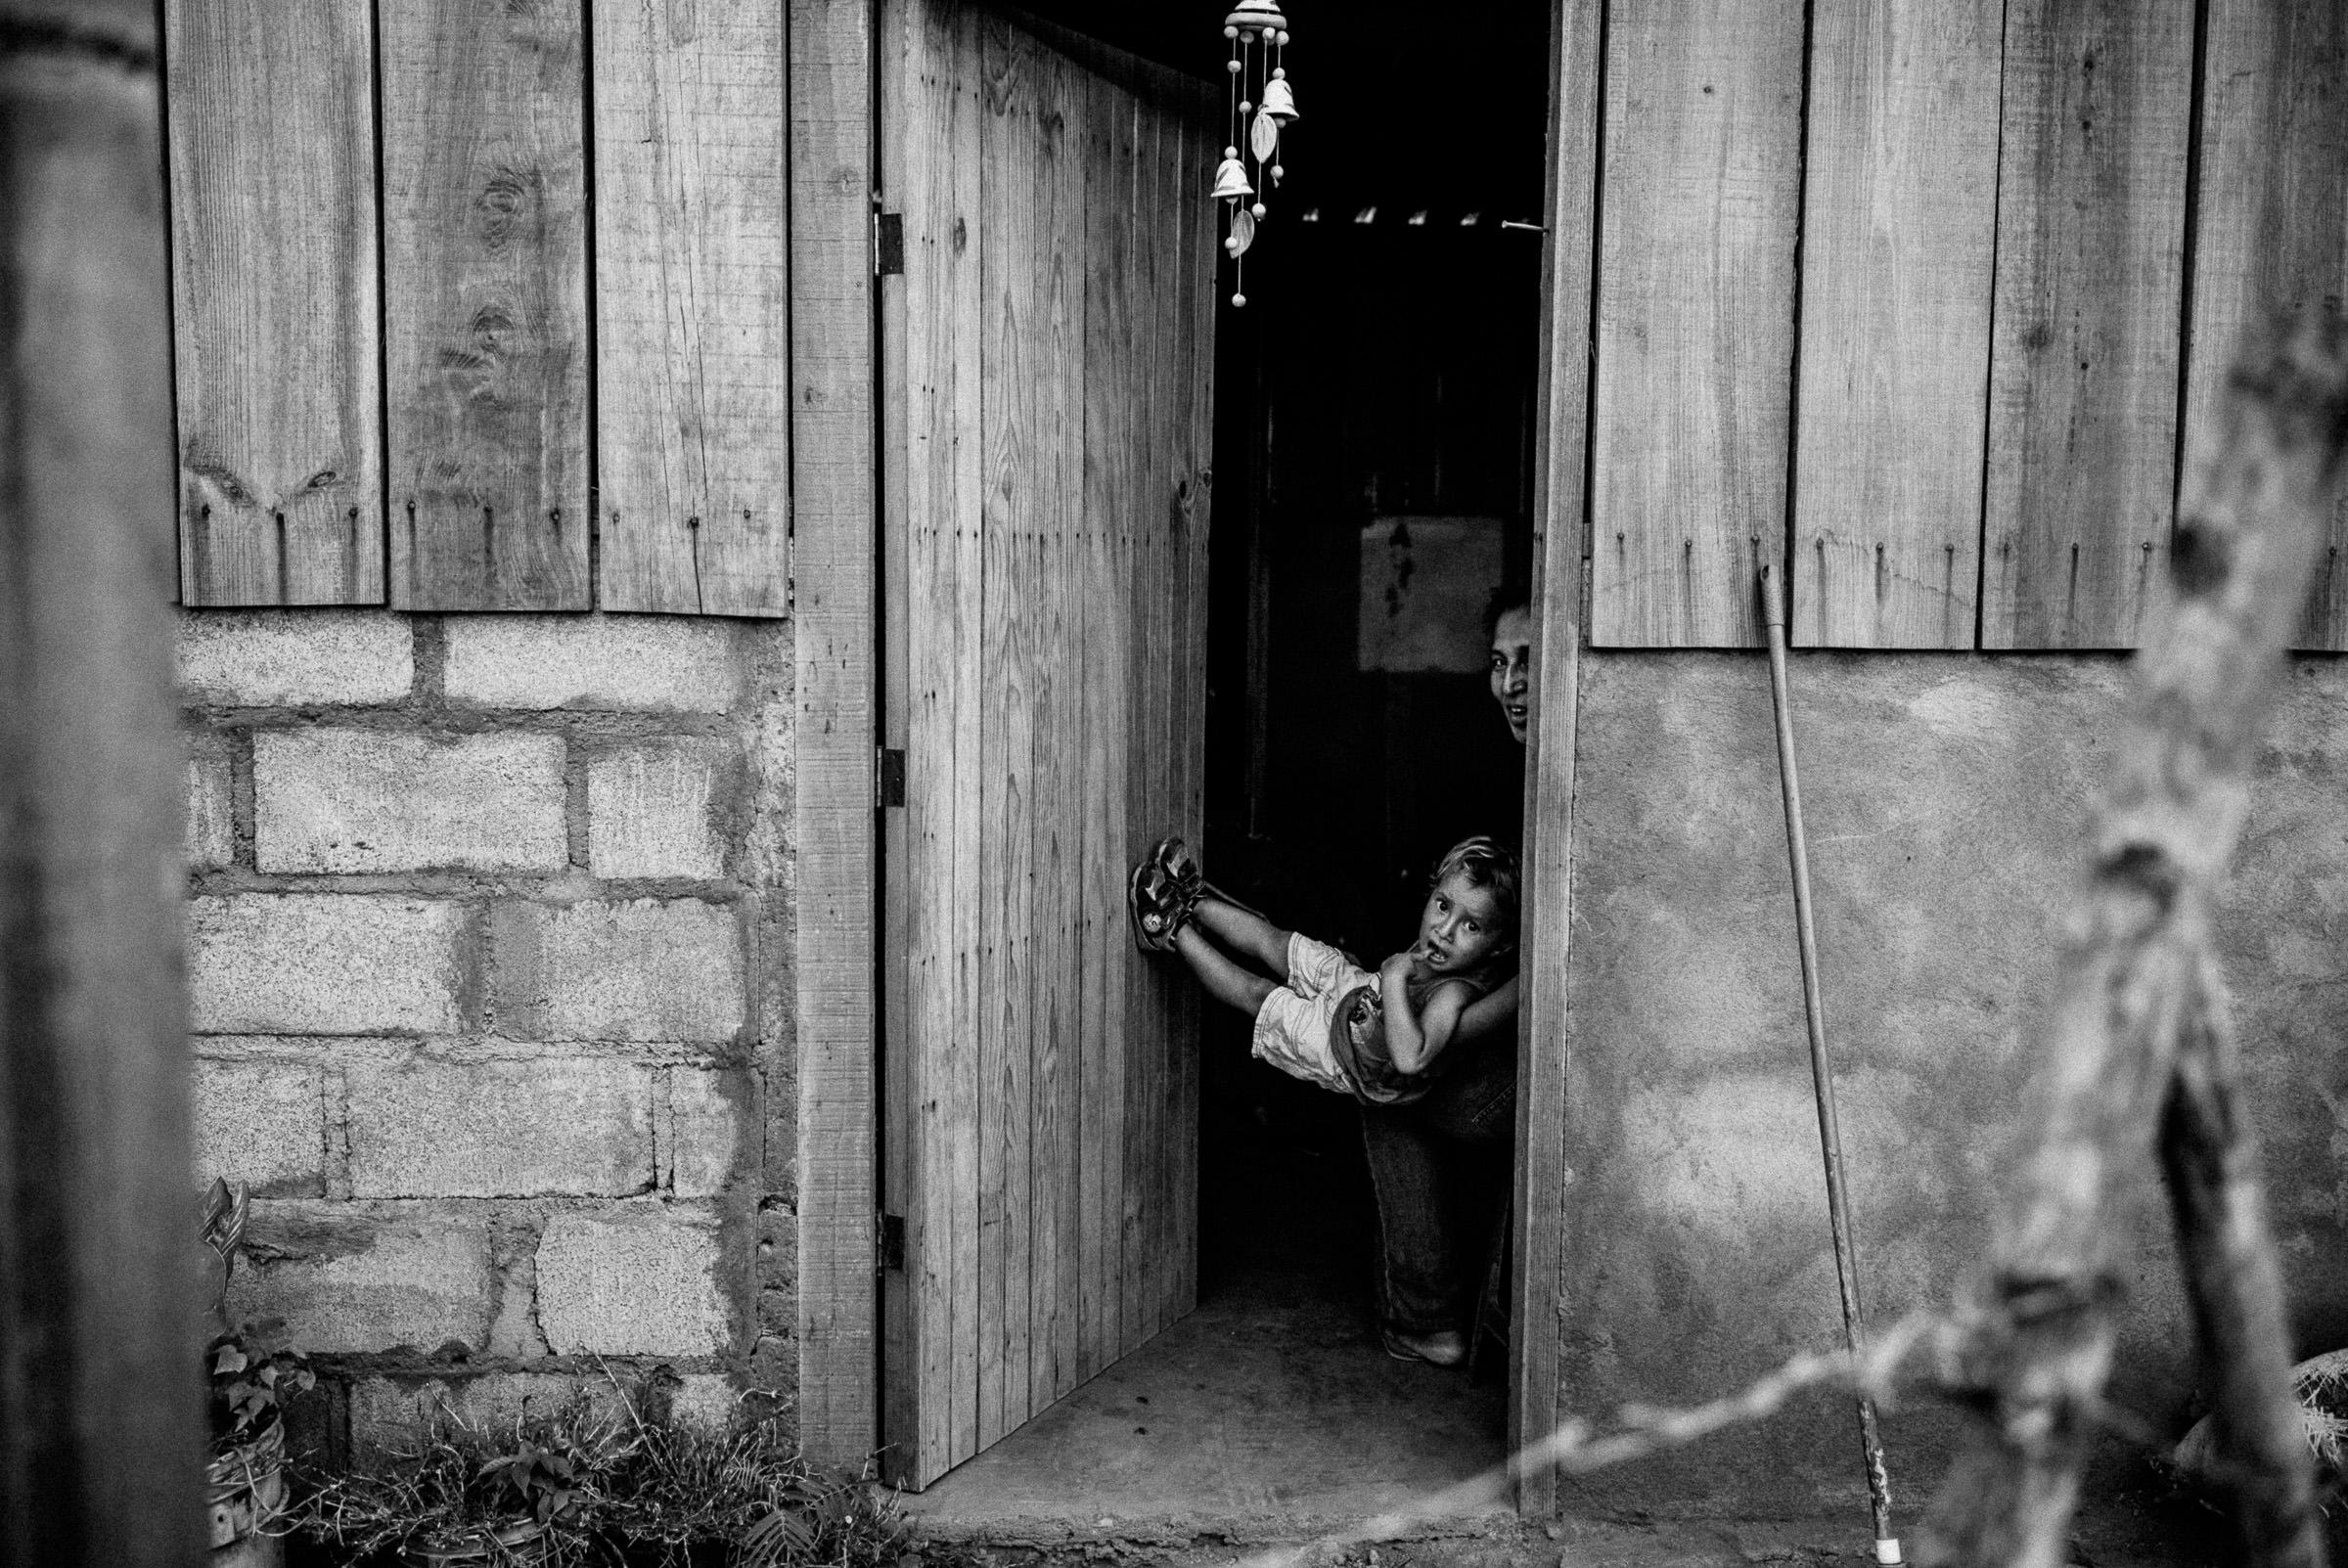 brandon_patoc_travel_photographer_in_nicaragua_0003.jpg